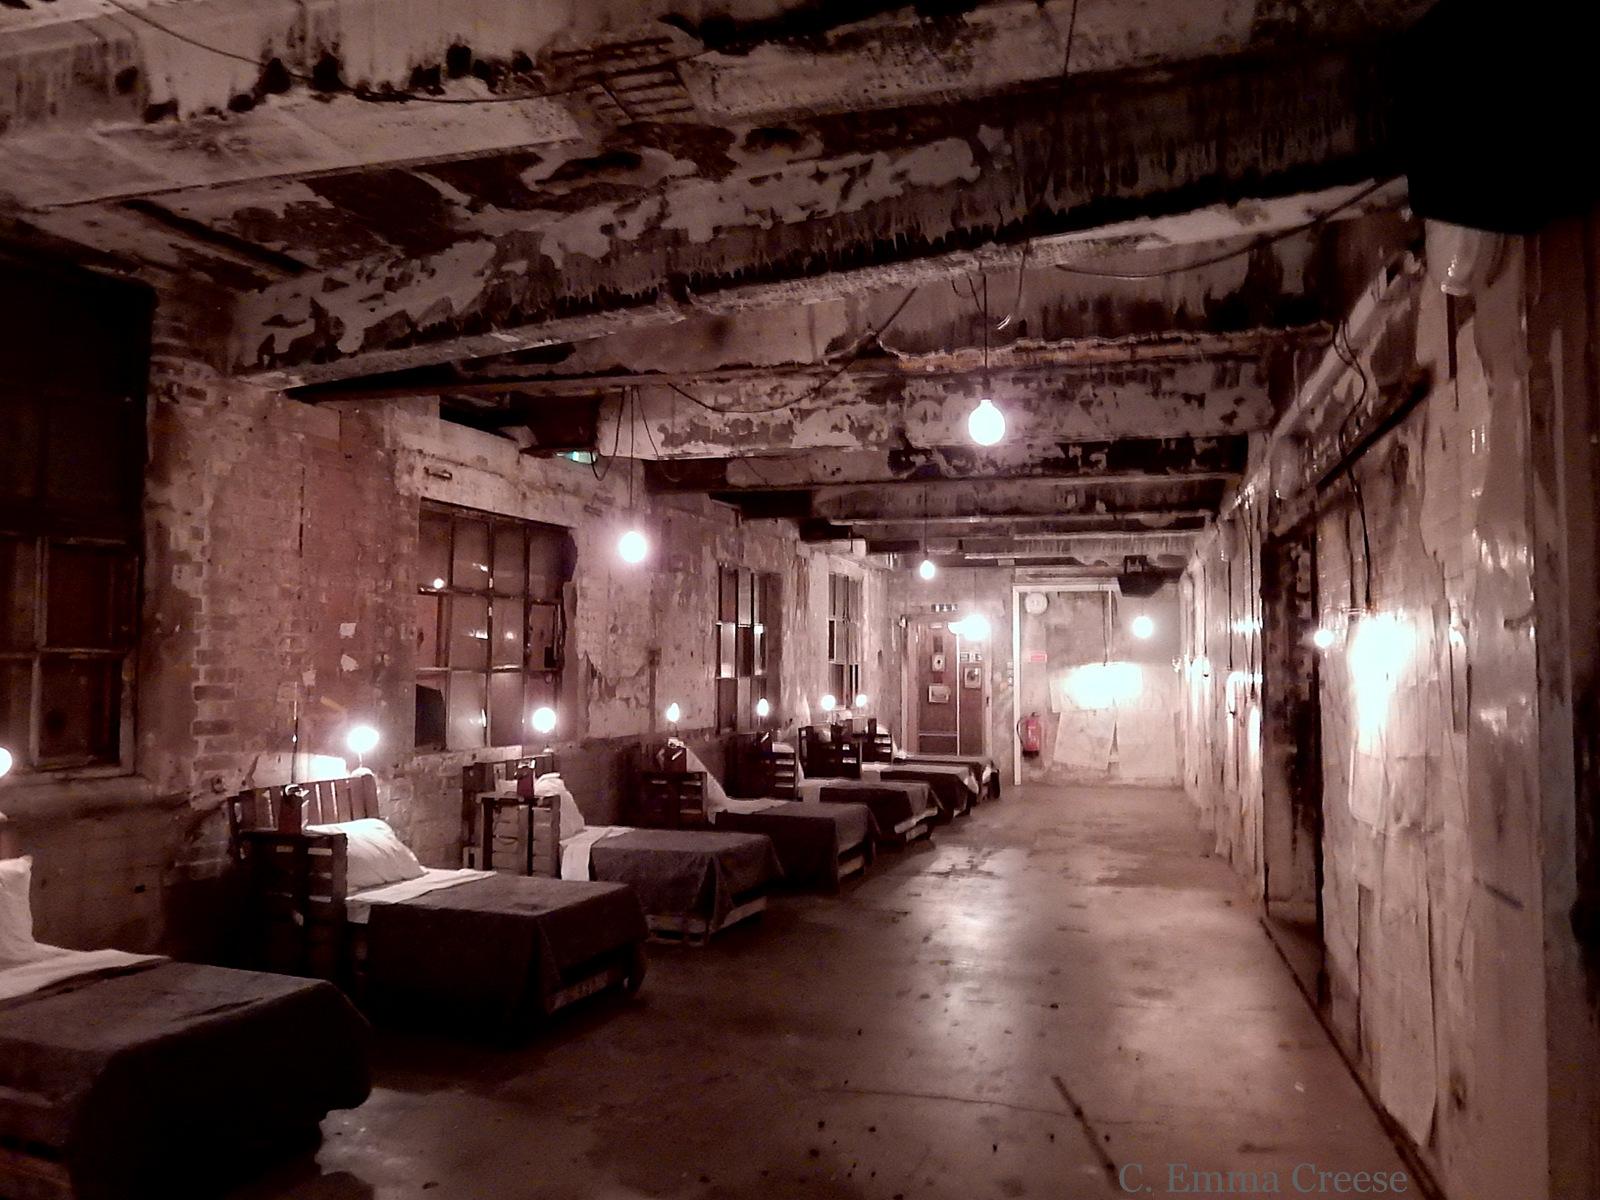 Immersive Theatre & Escape Rooms Adventures of a London Kiwi